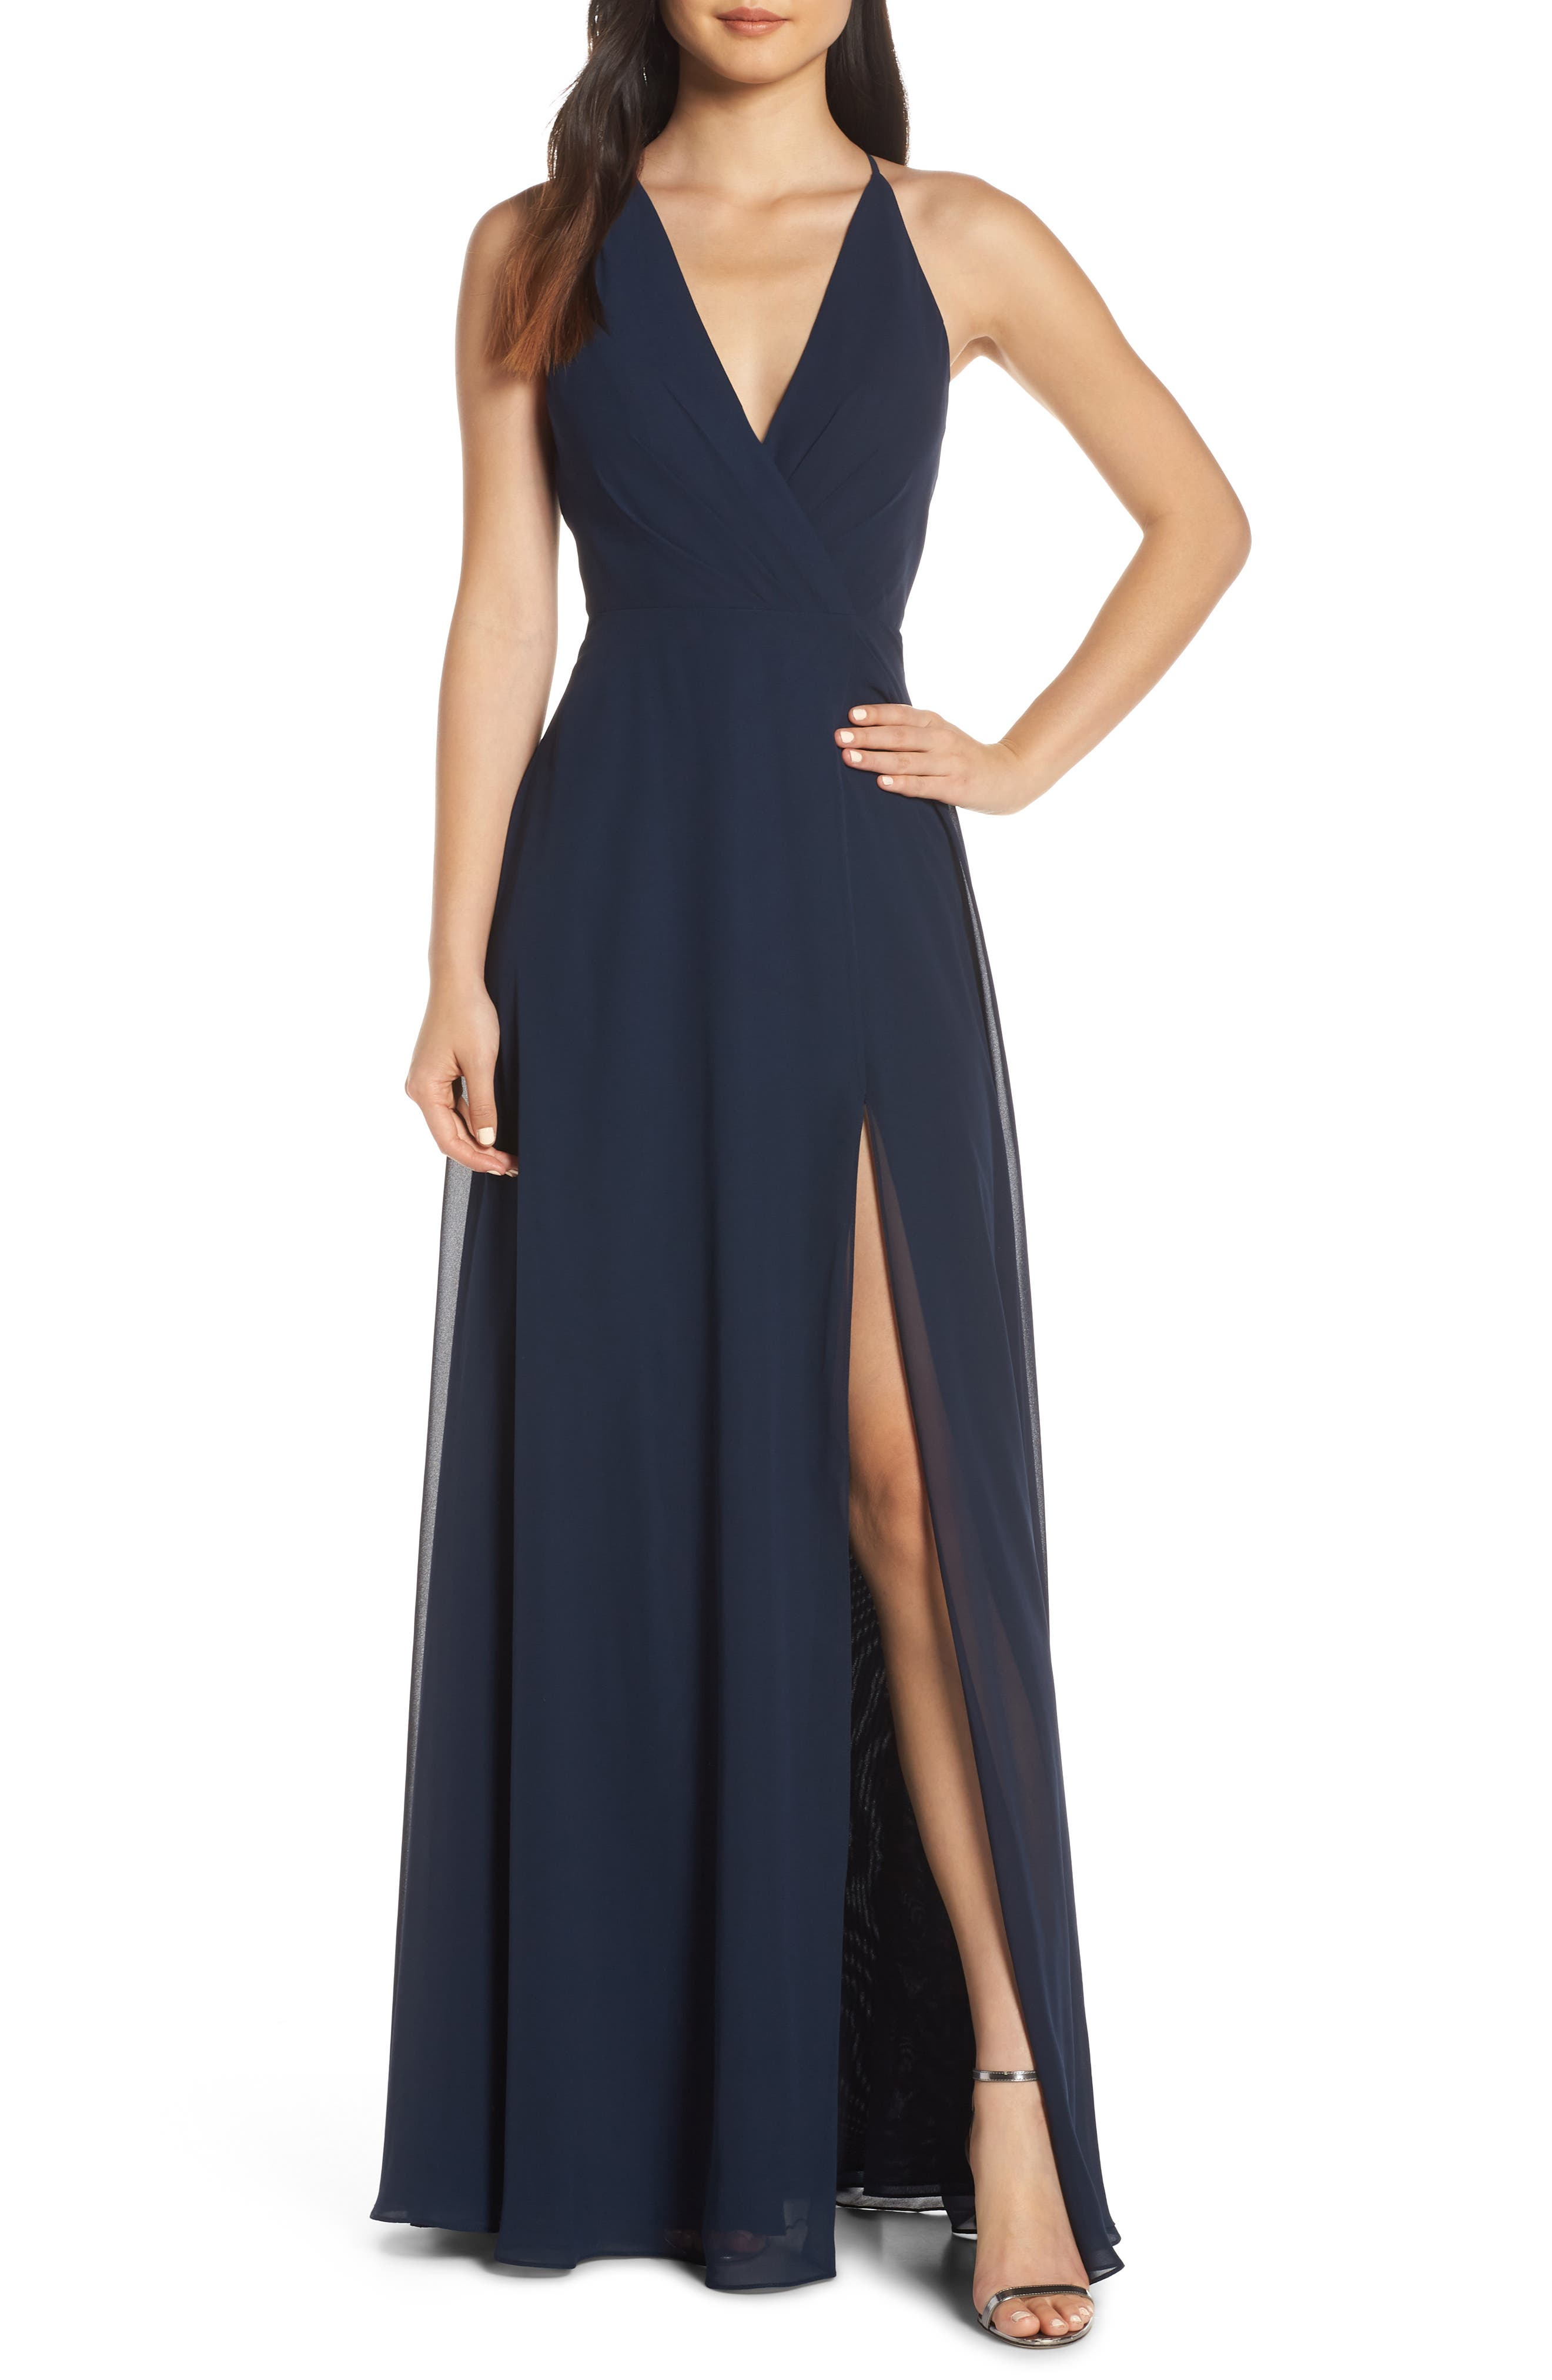 JENNY YOO Bryce Surplice V-Neck Chiffon Evening Dress, Main, color, NAVY